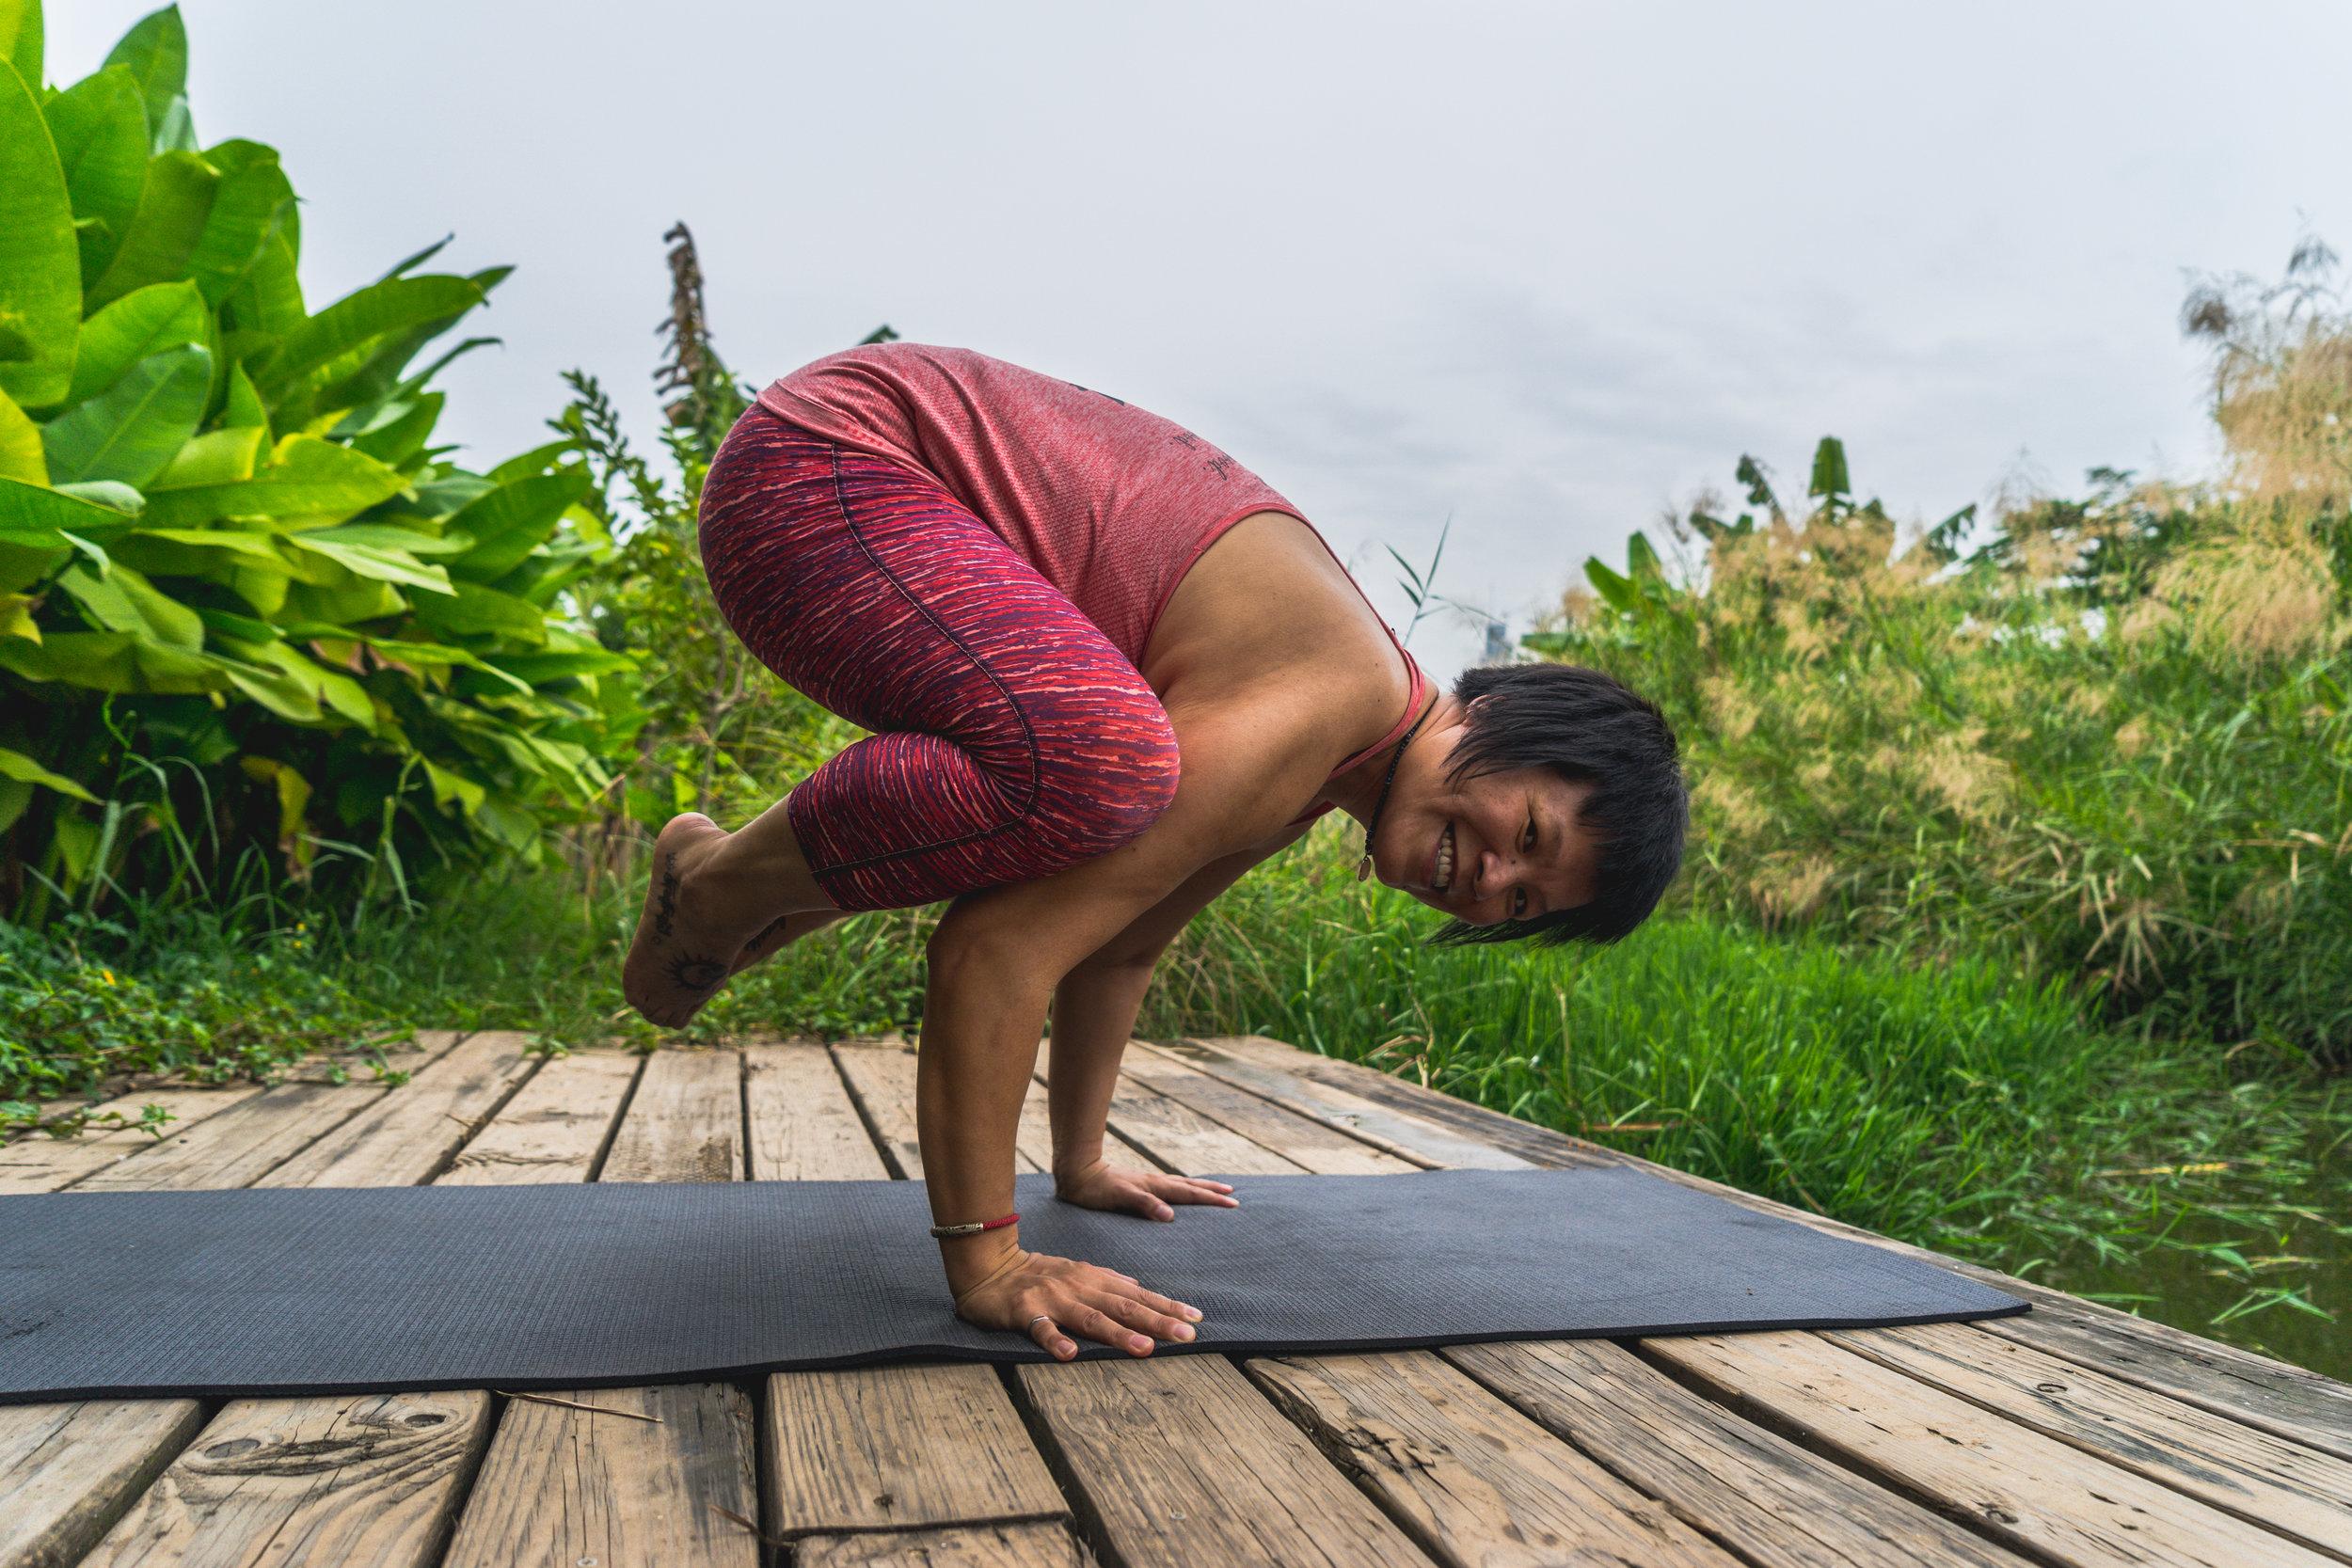 hang-nhan-yoga-mindfulness-masterclass-saigon-ho-chi-minh-city-vietnam